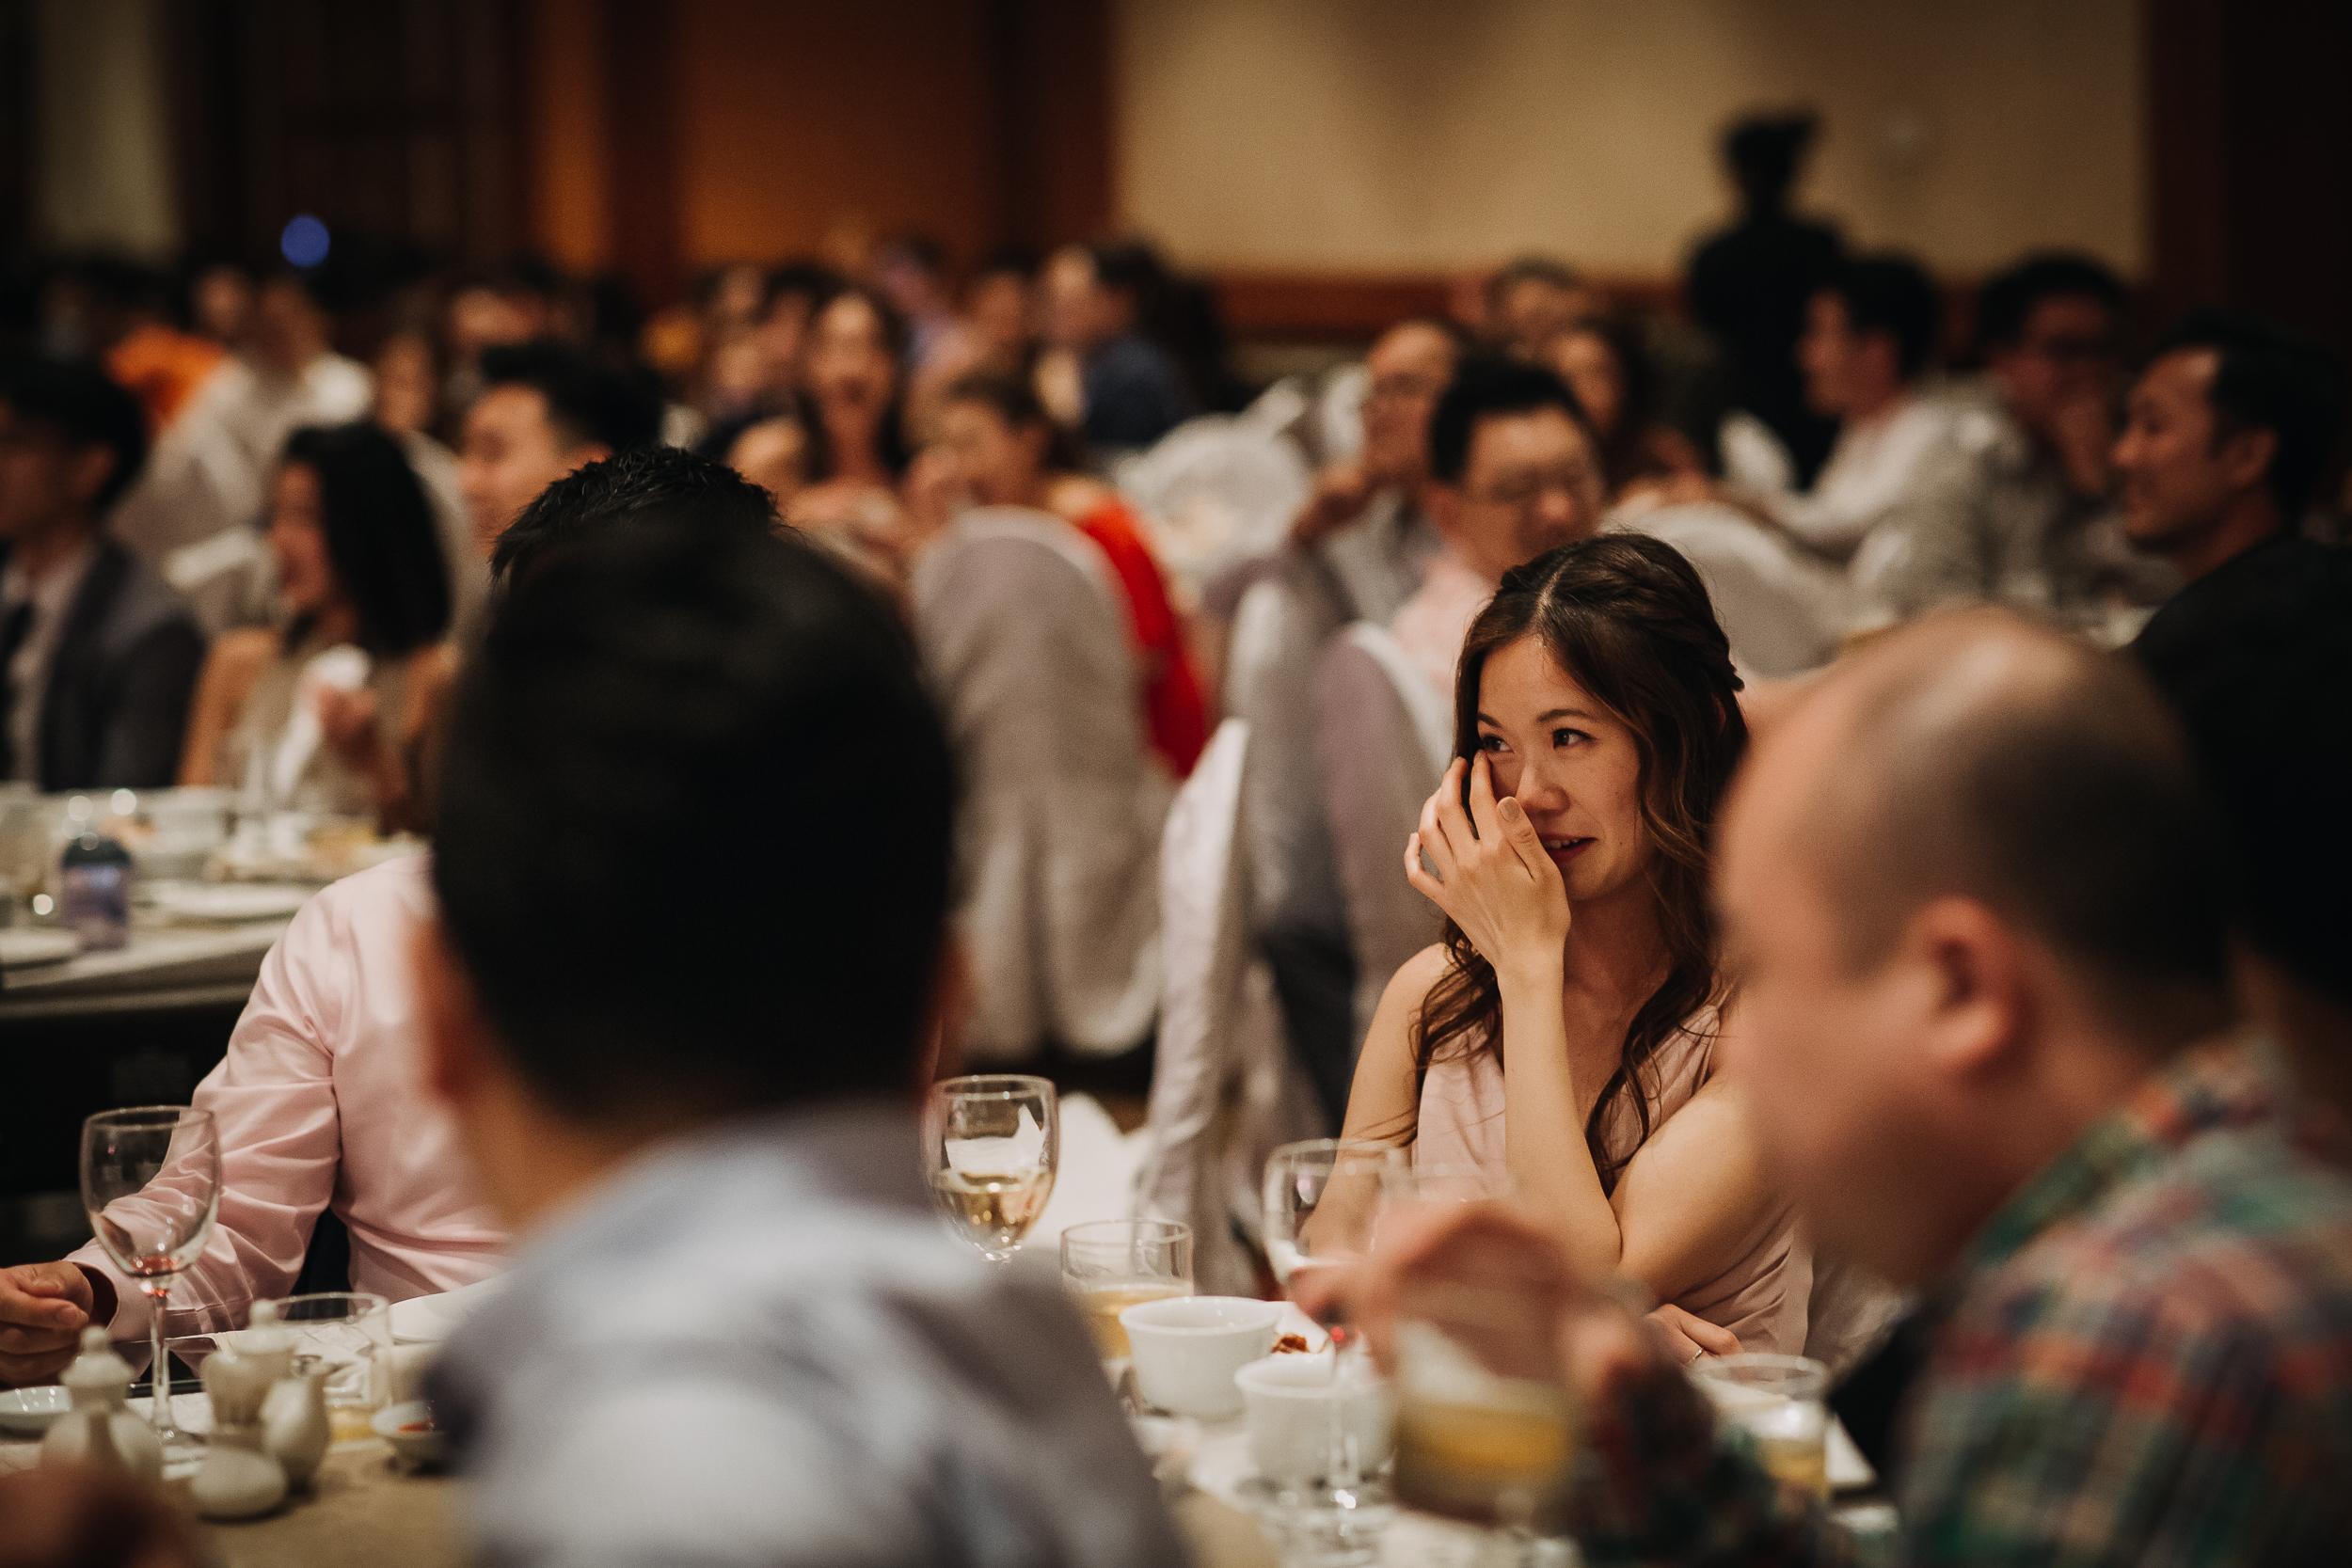 Singapore+Actual+Day+Wedding+Photographer+Raffles+Town+Club+Jeremiah+Christina-0092.jpg